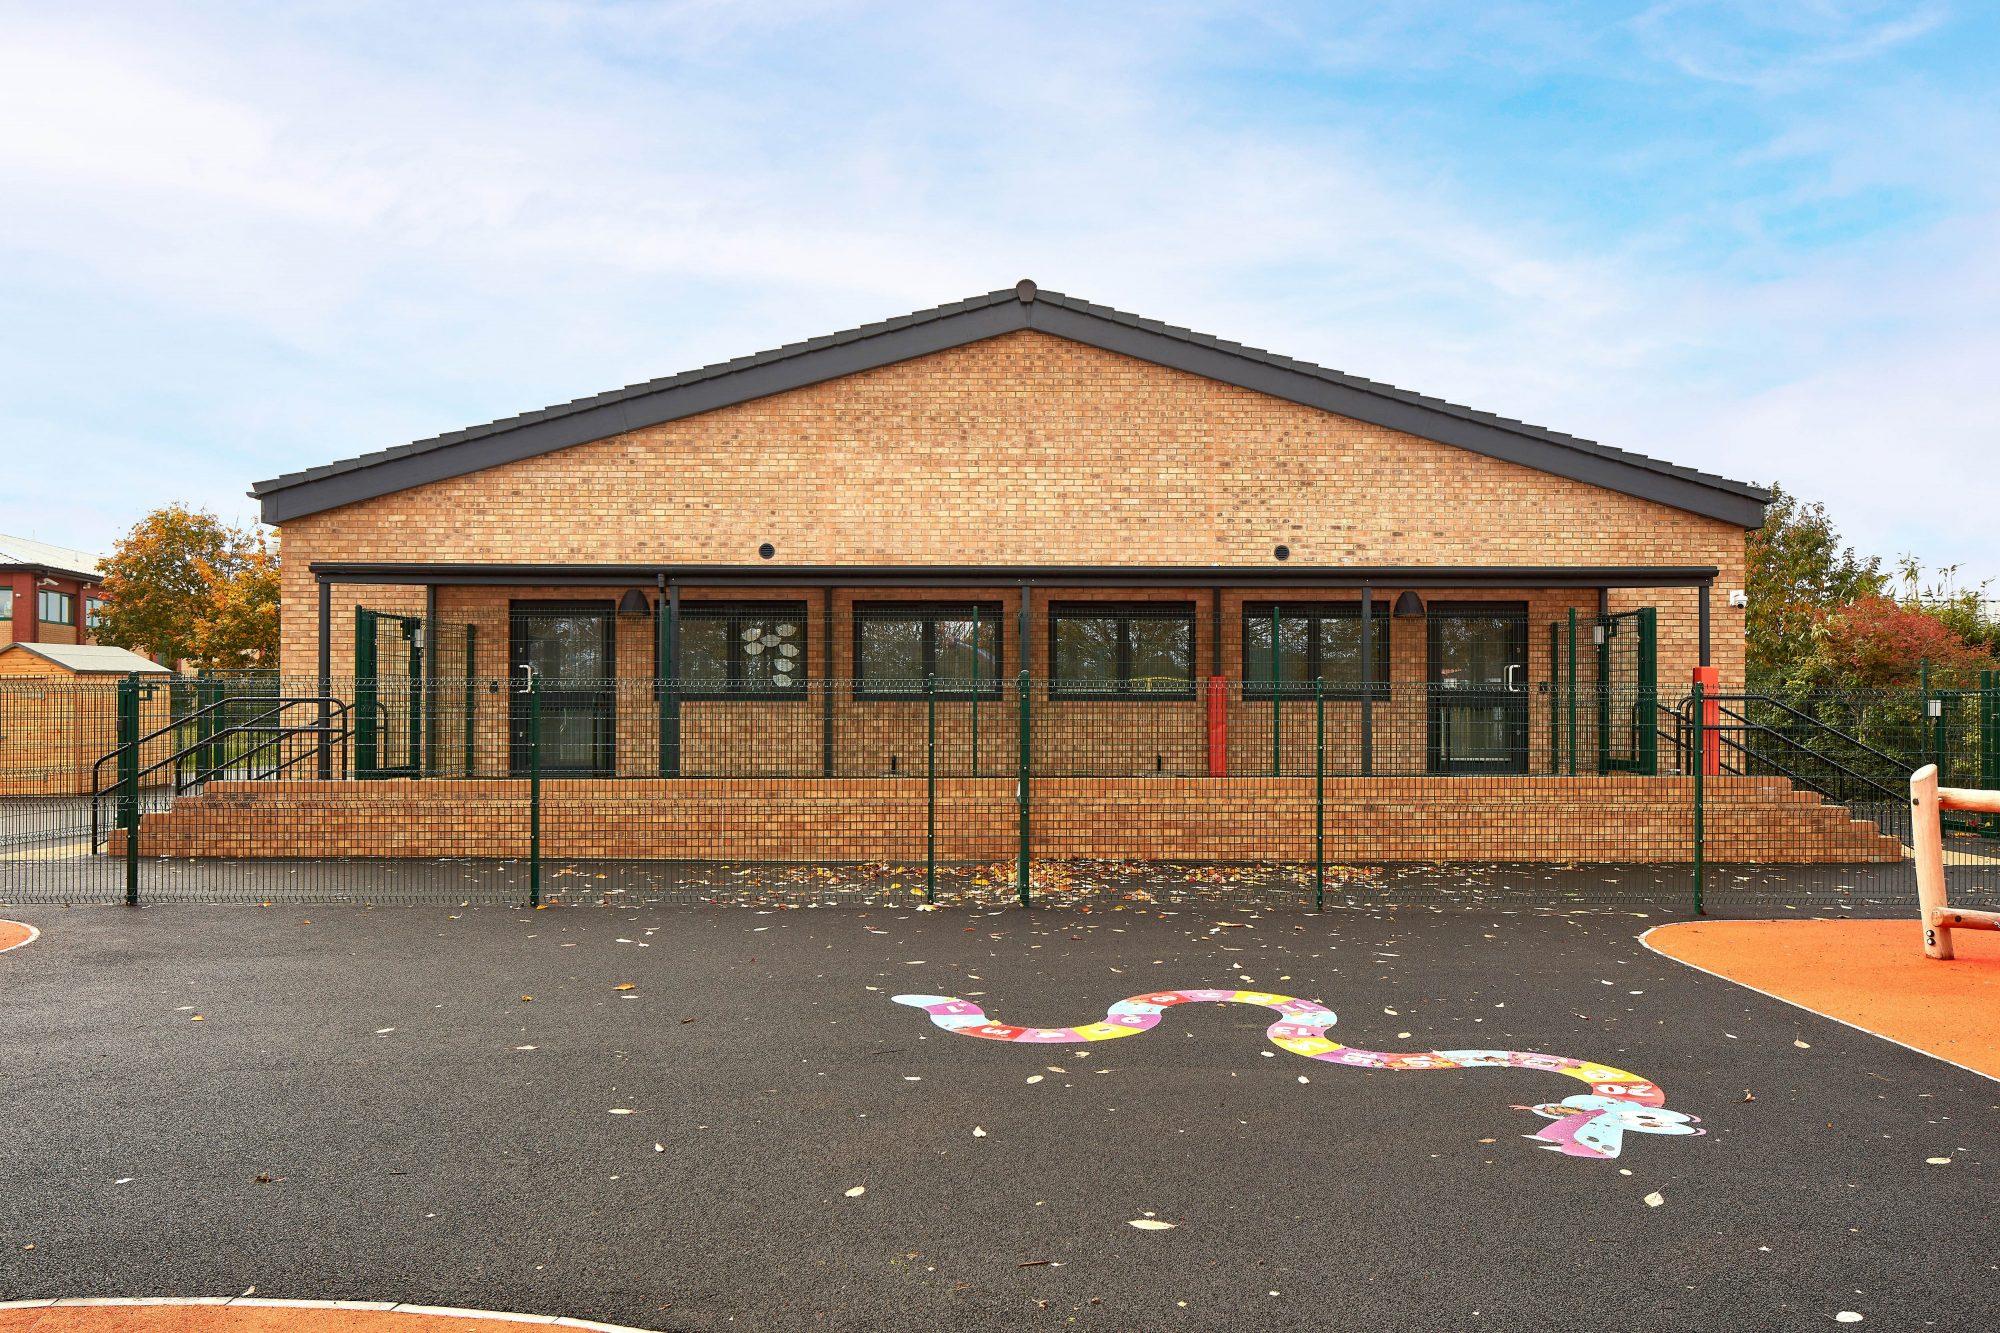 Case study: Special build for special school